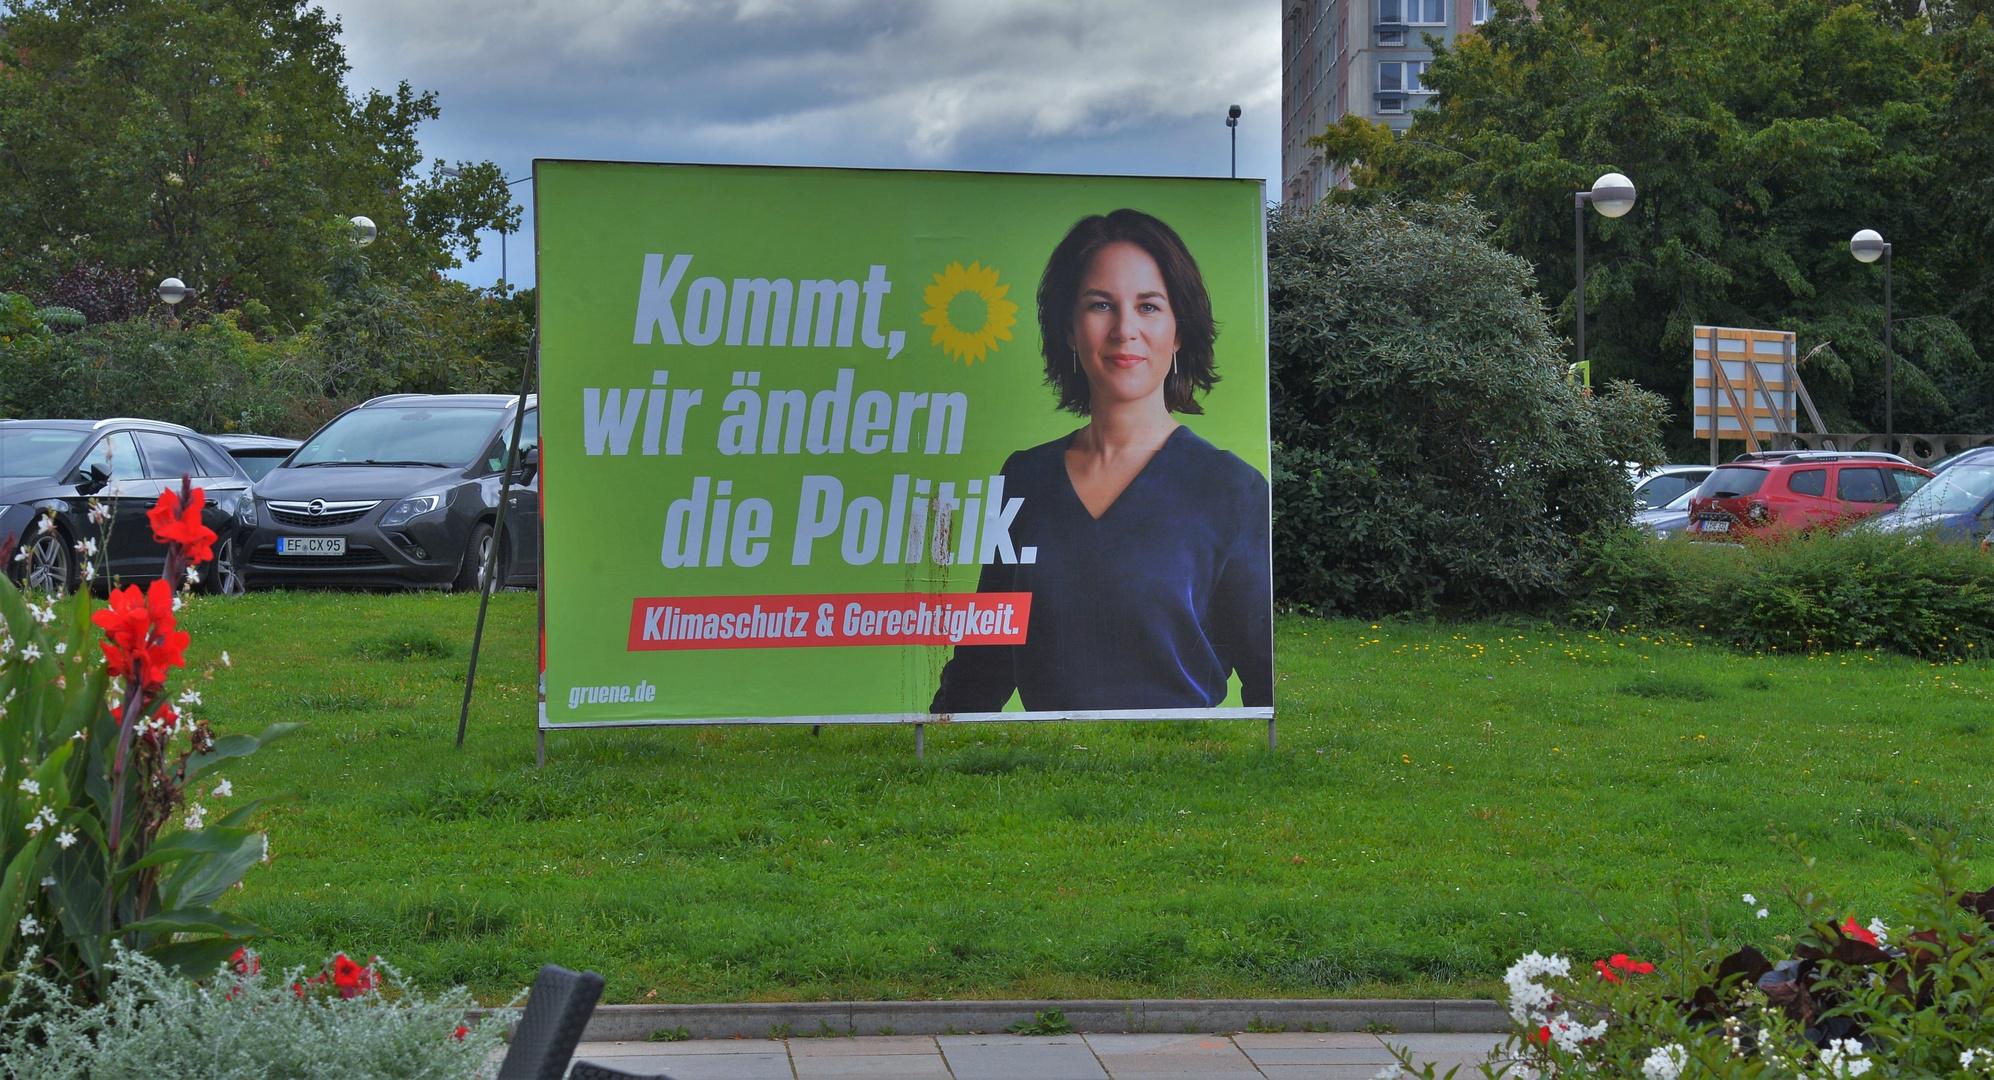 Erfurt, es wird grün (Erfurt, va a ser verde)